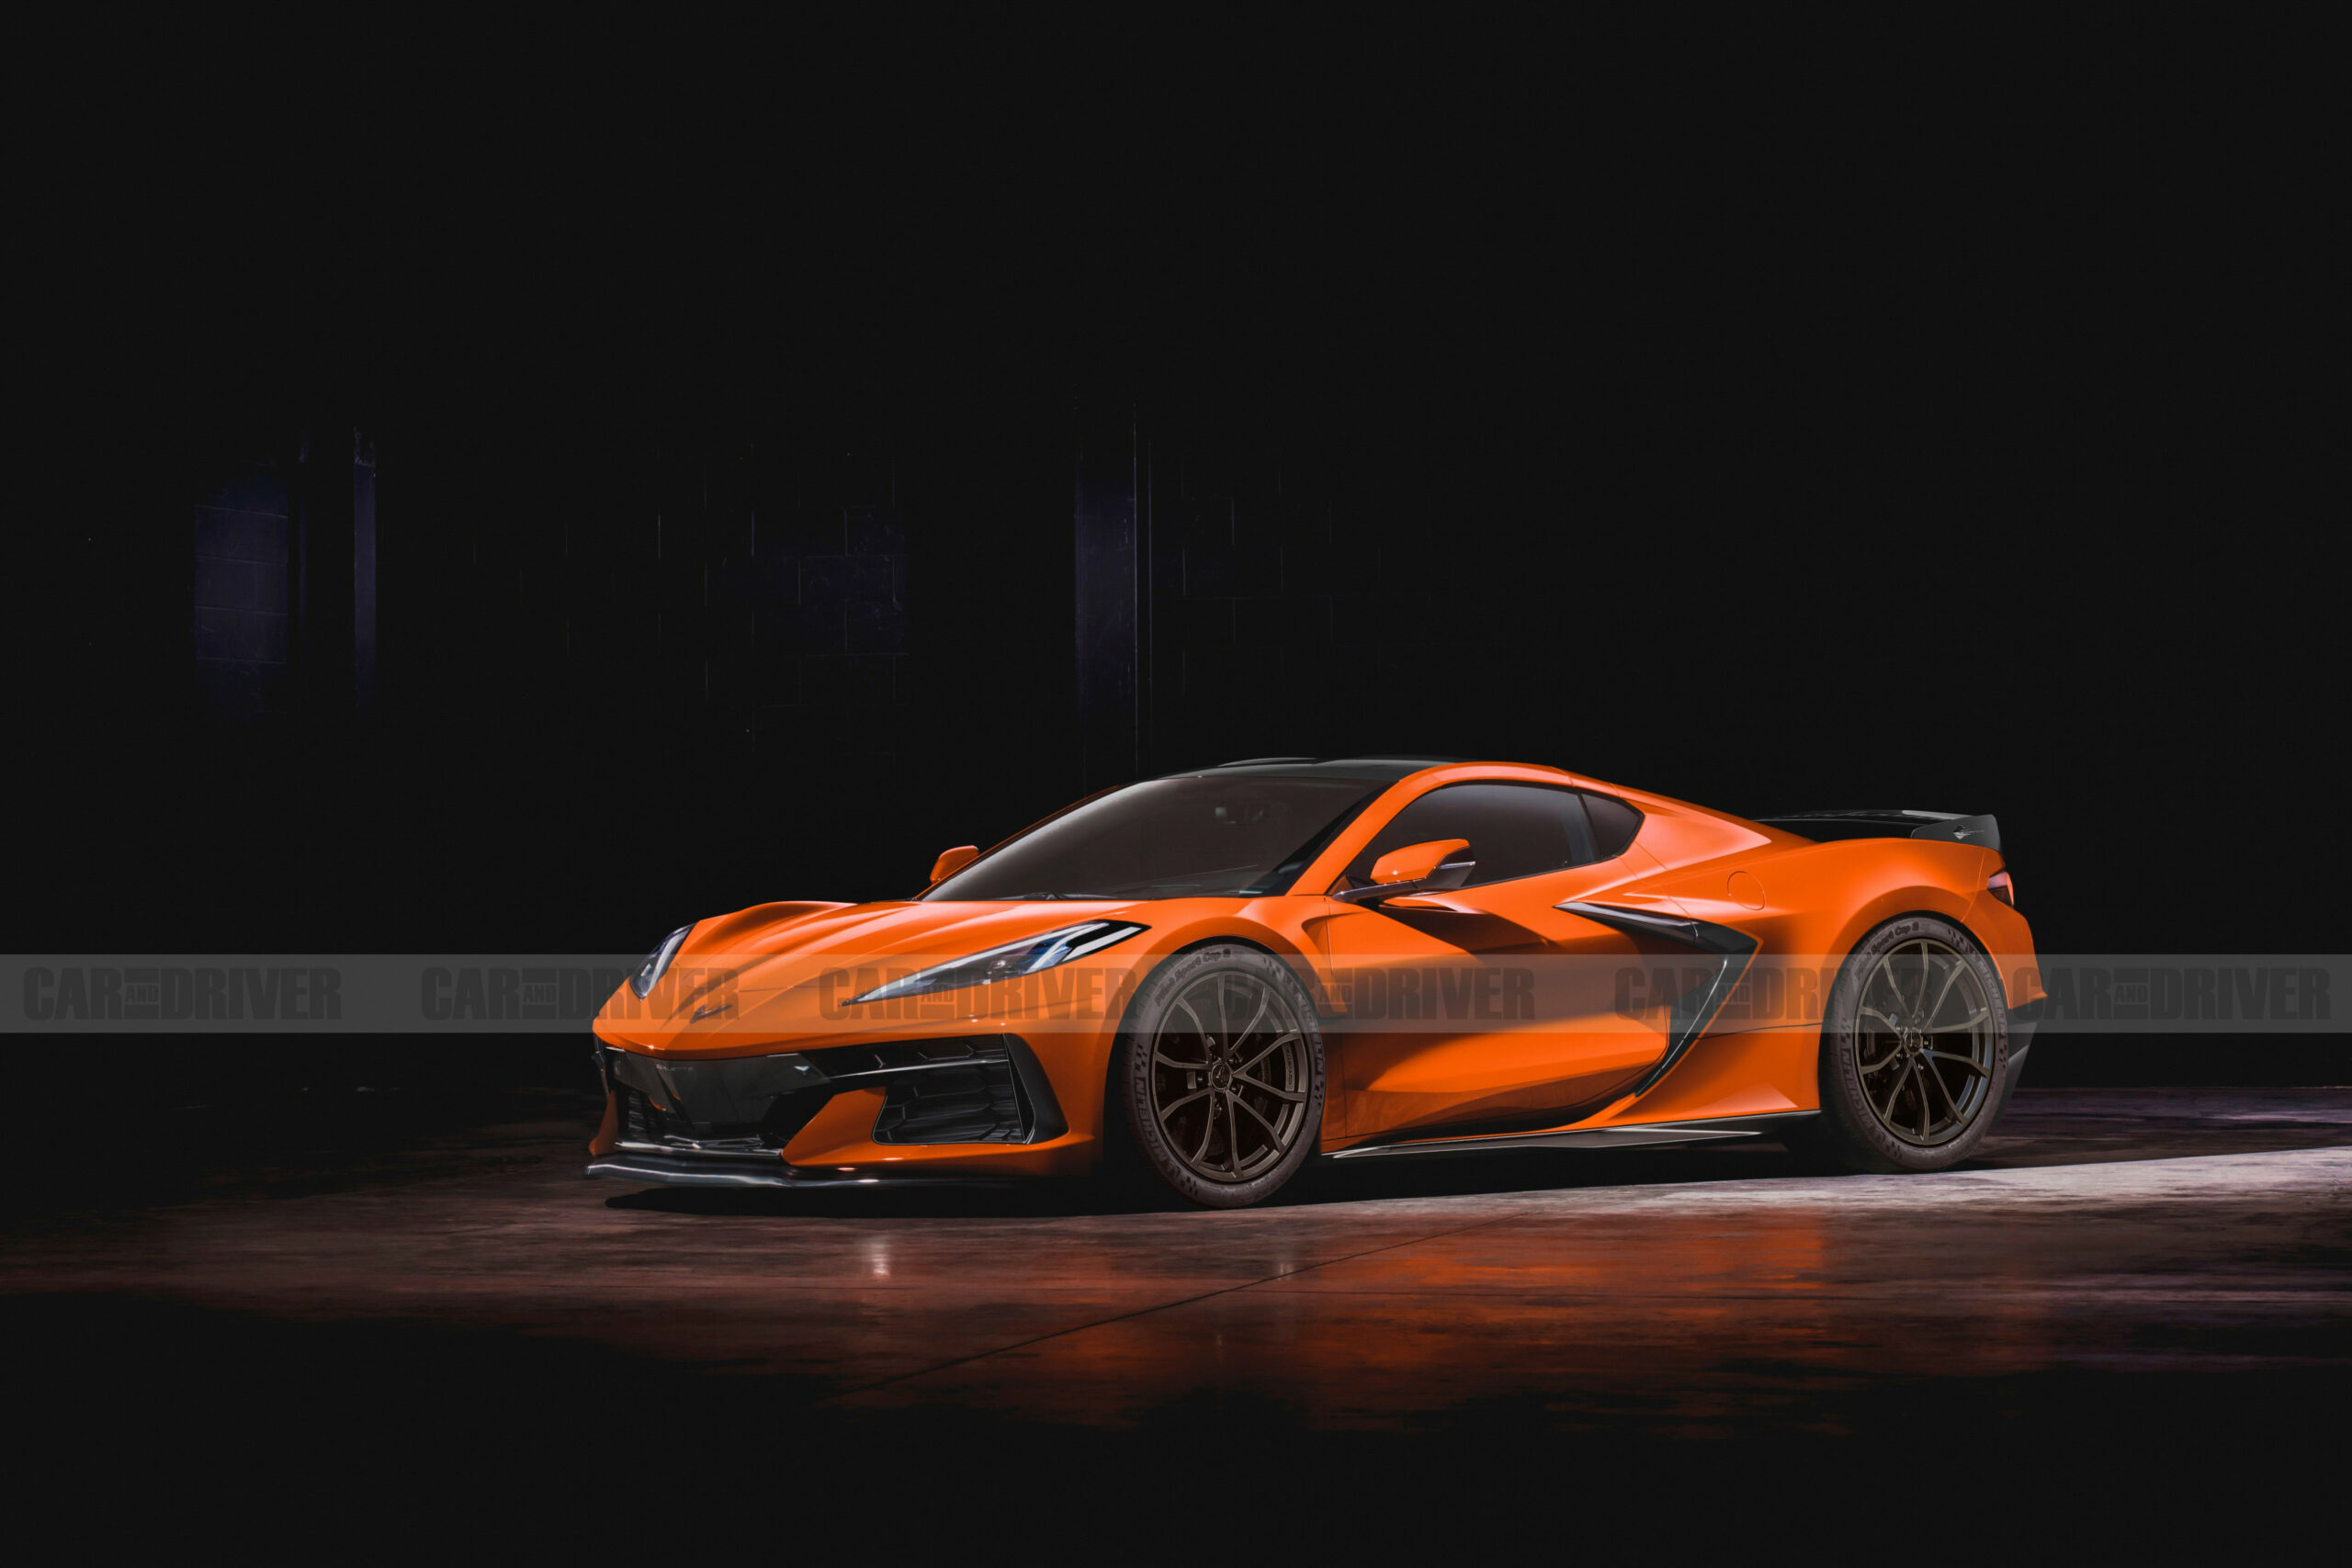 Pricing 2022 Chevrolet Corvette Mid Engine C8